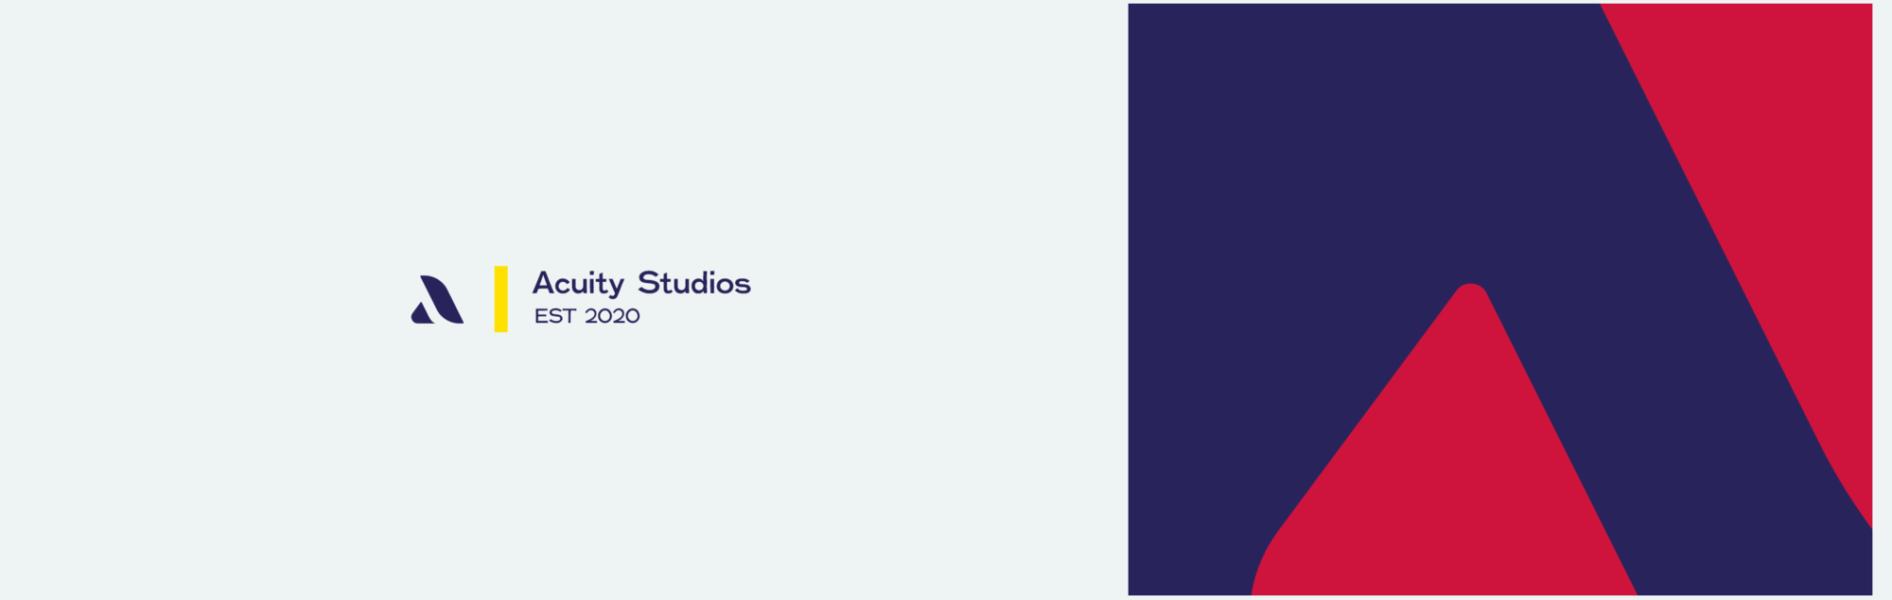 Acuity Studios Banner